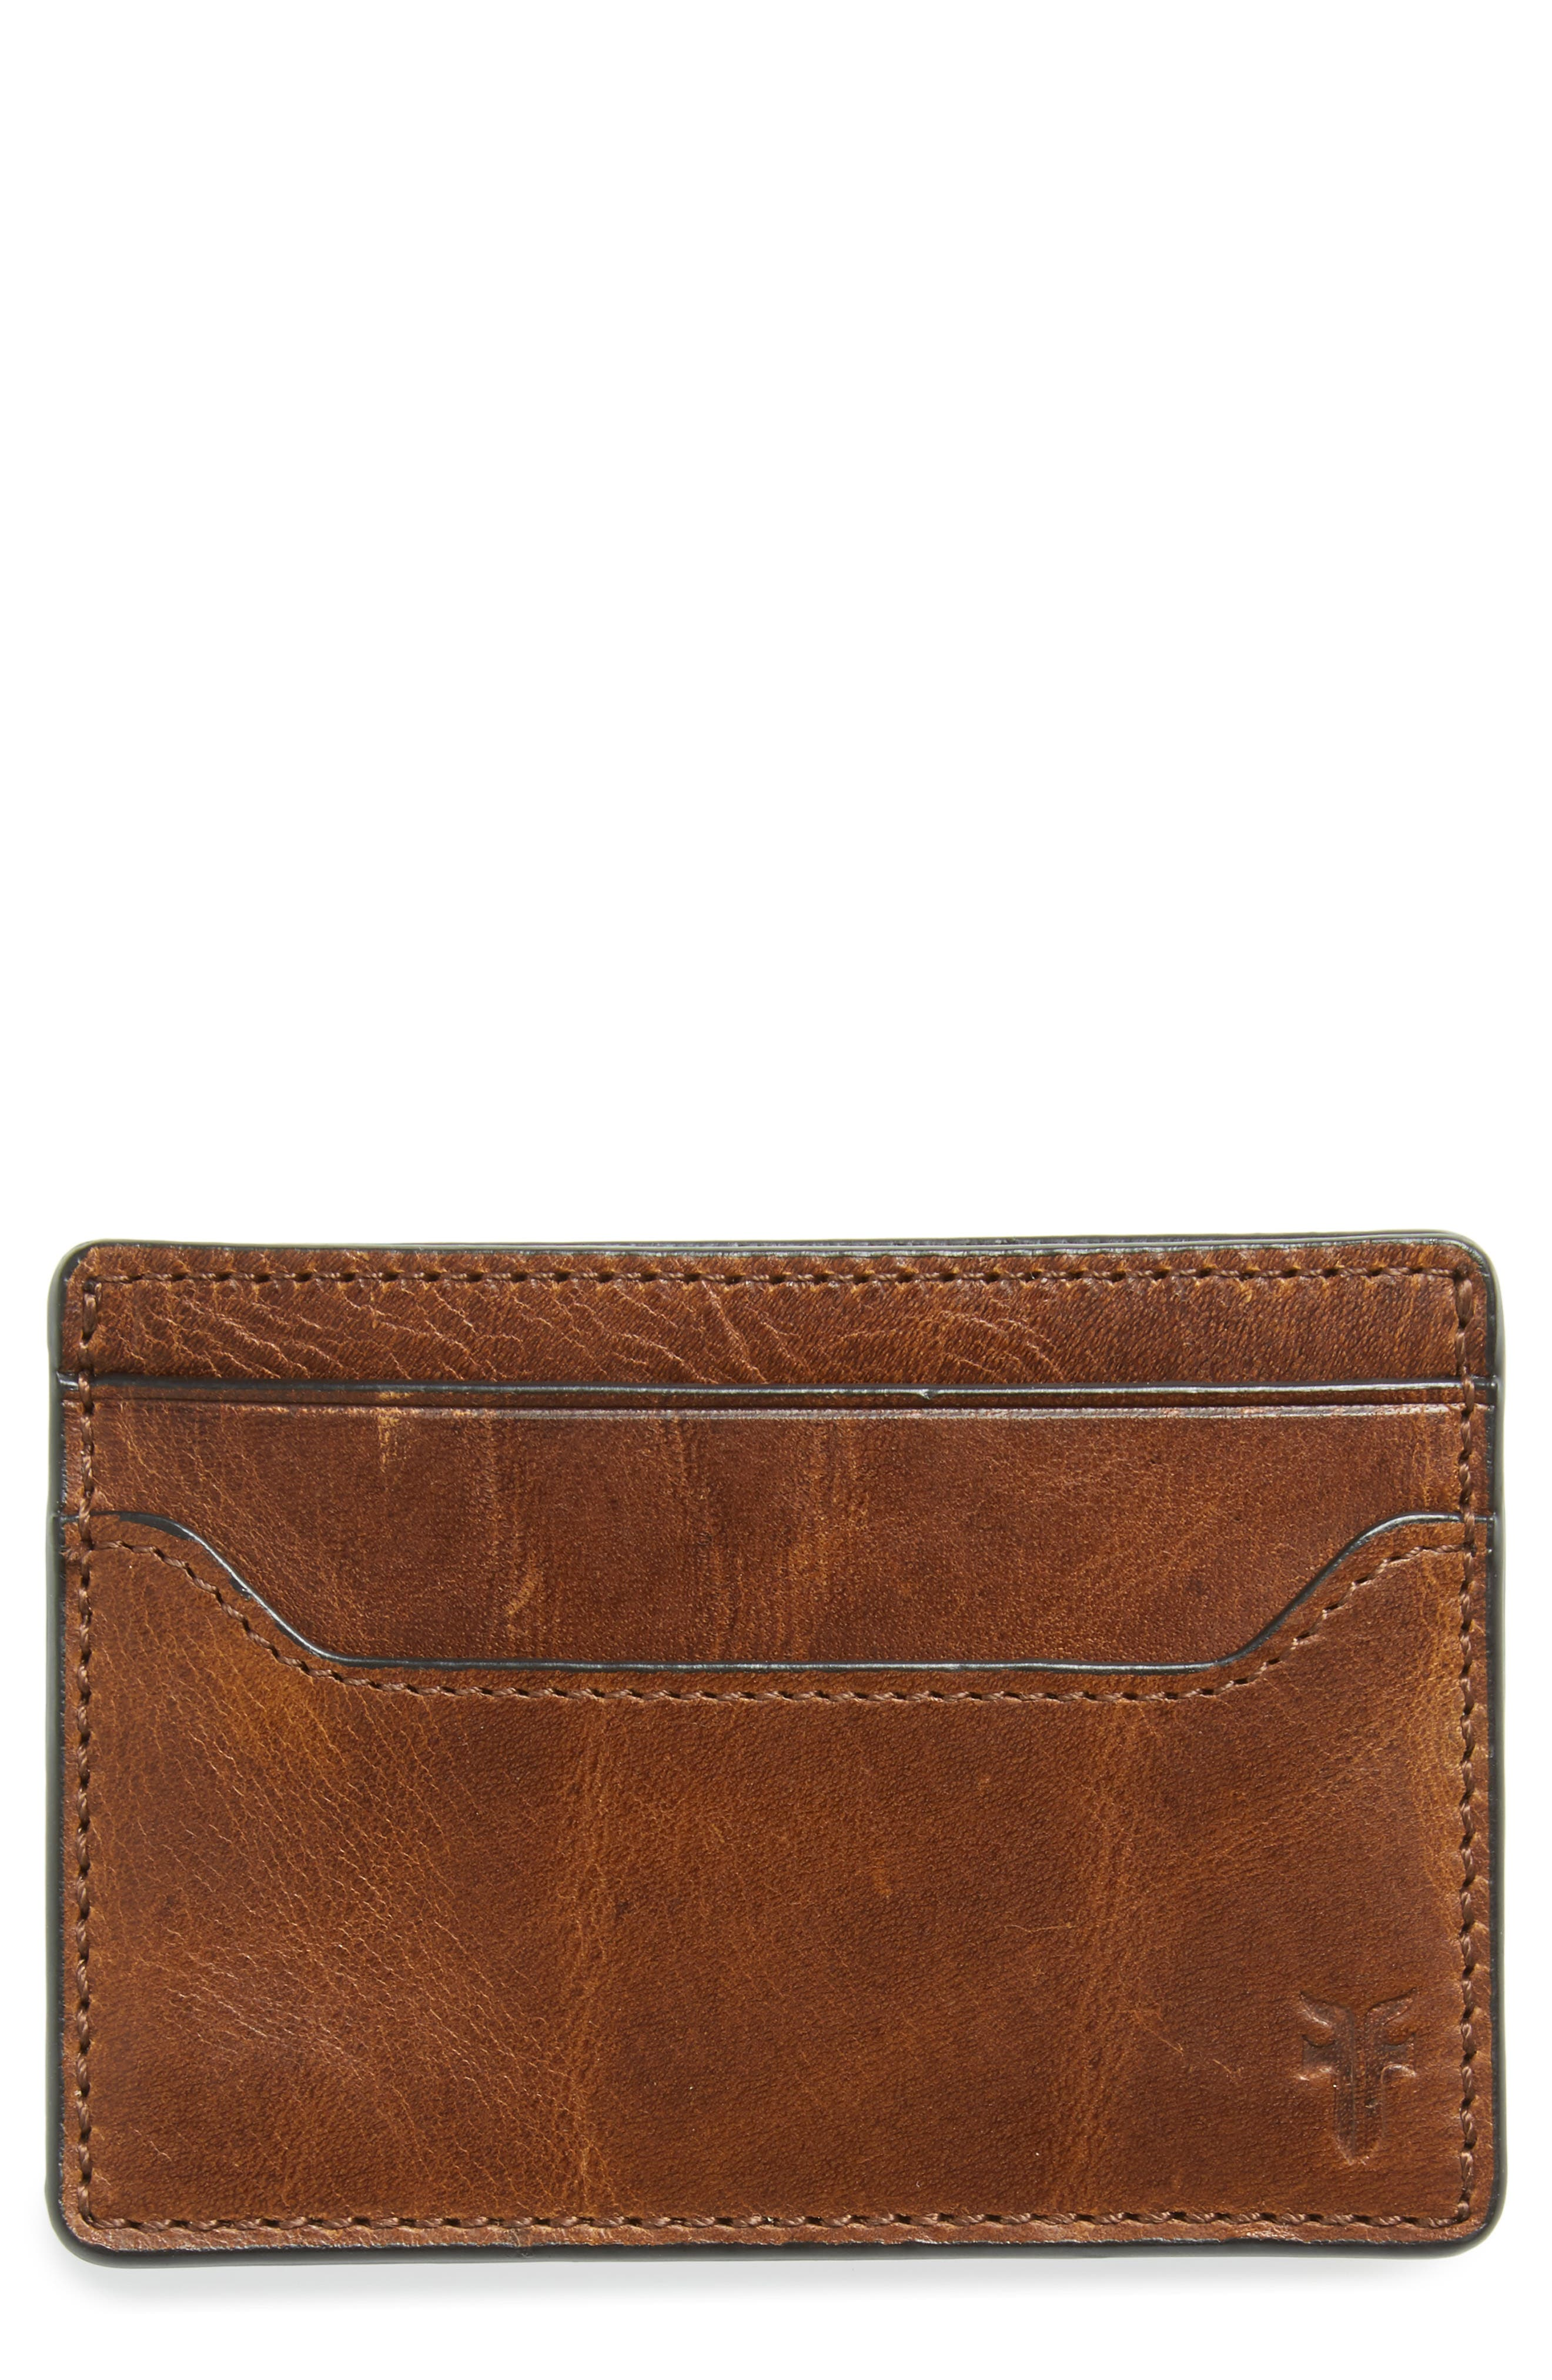 FRYE Logan Leather Money Clip Card Case, Main, color, DARK BROWN